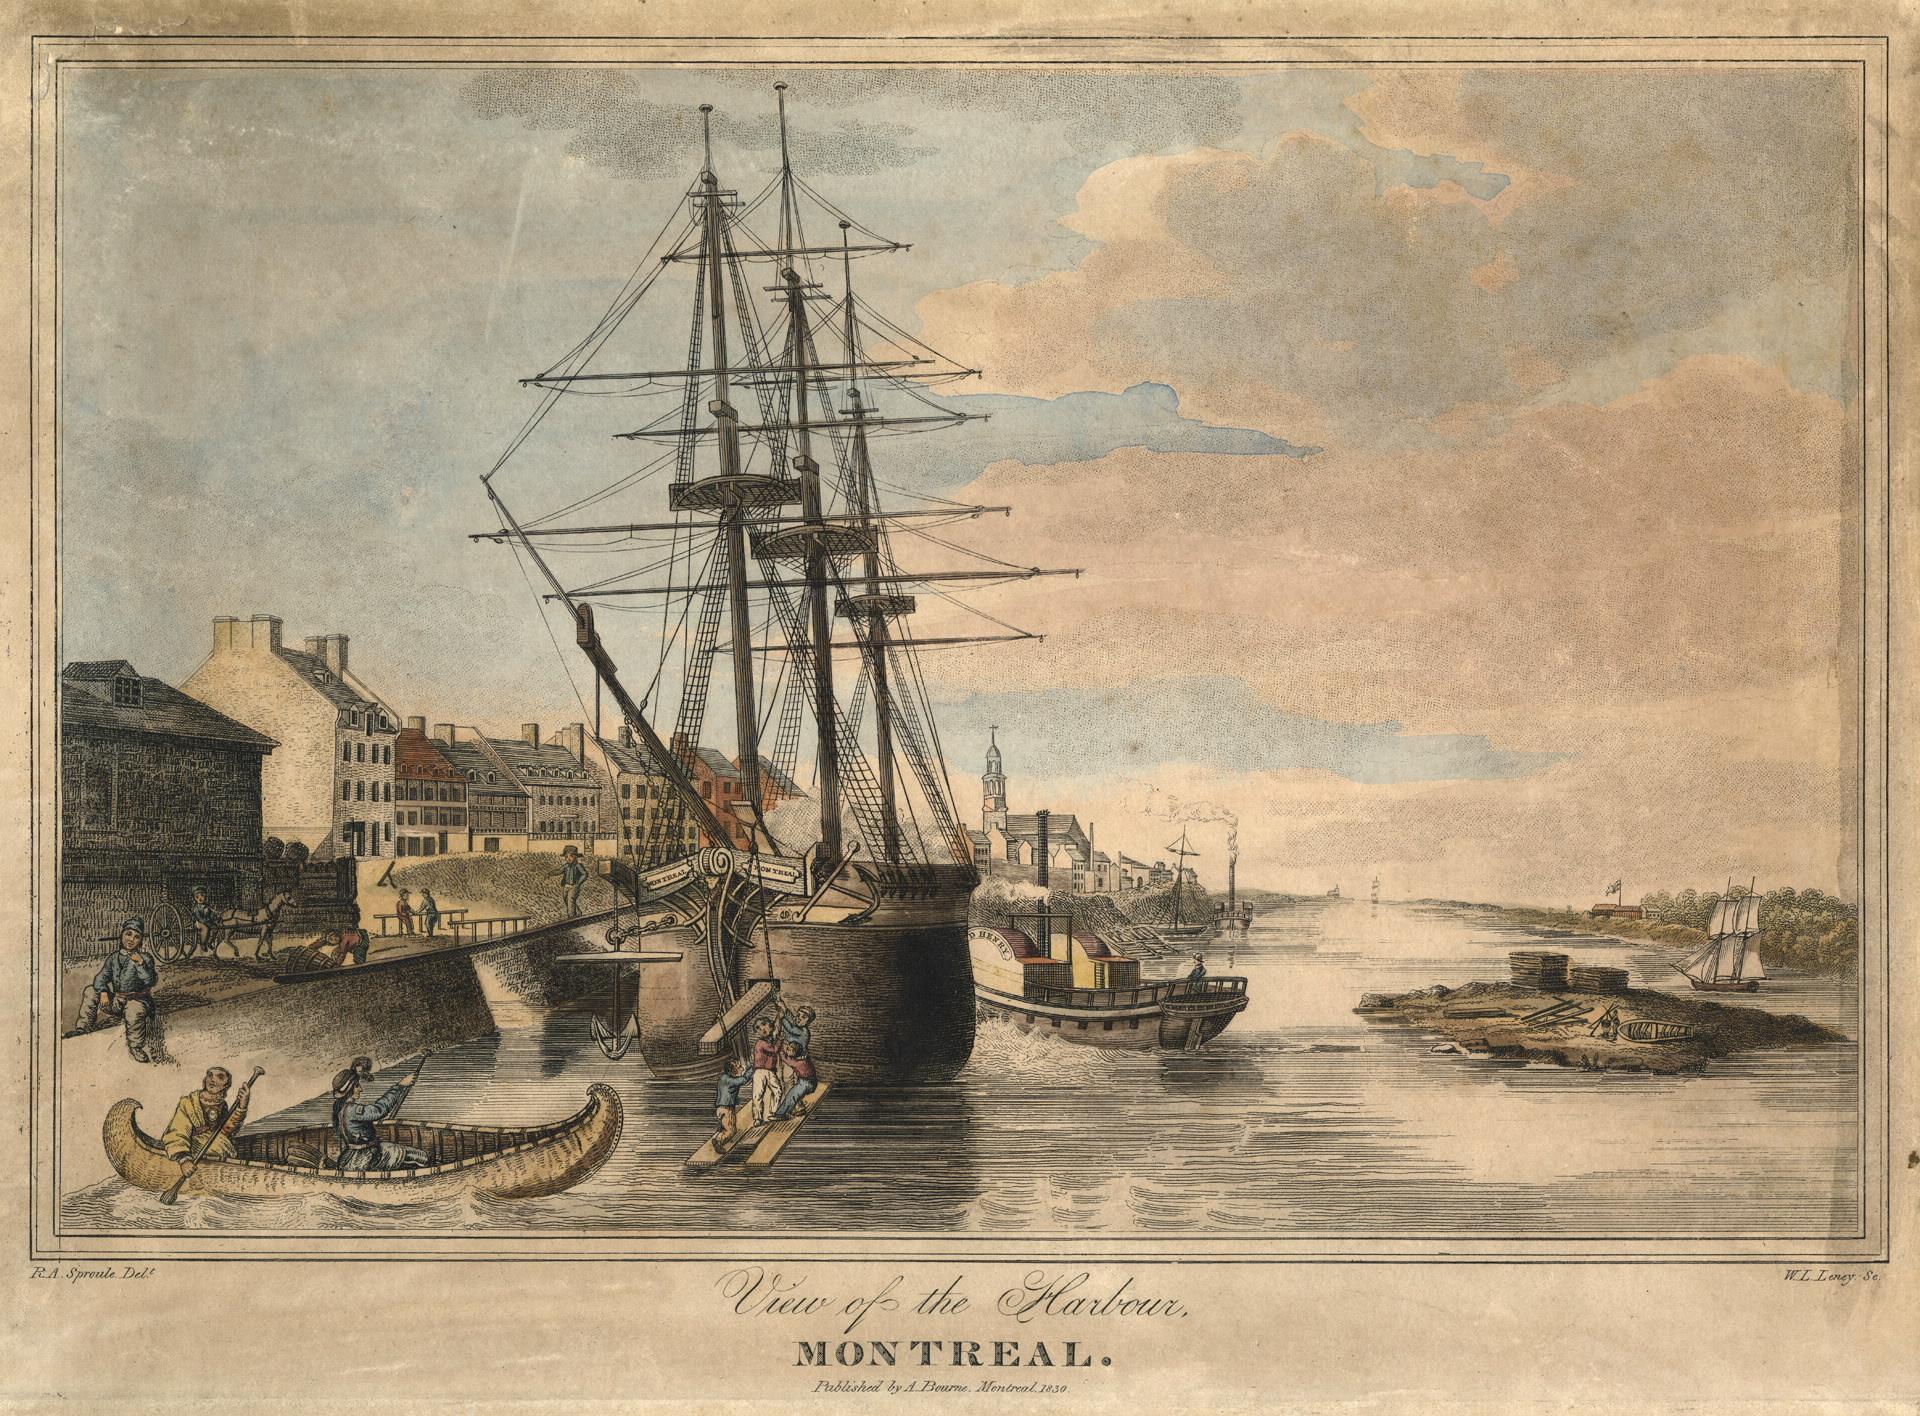 Aquarelle du port en 1830